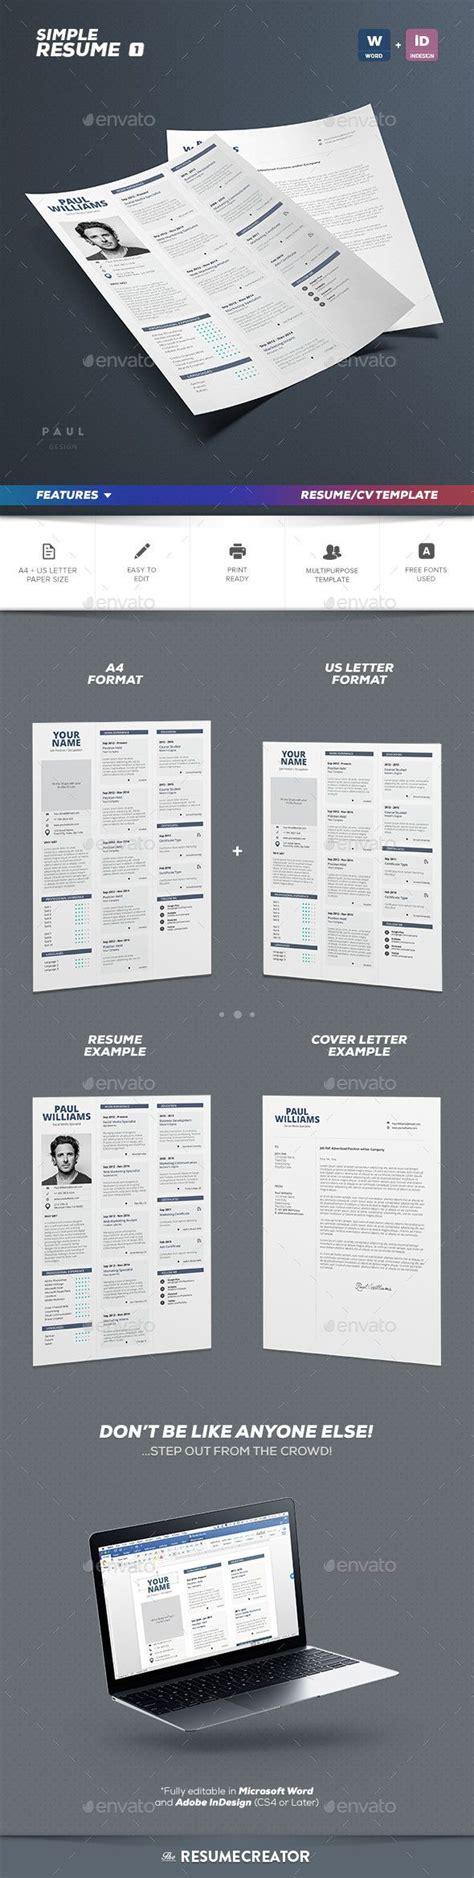 Simple Resume Template Vol 7 by Best 25 Simple Resume Ideas On Simple Resume